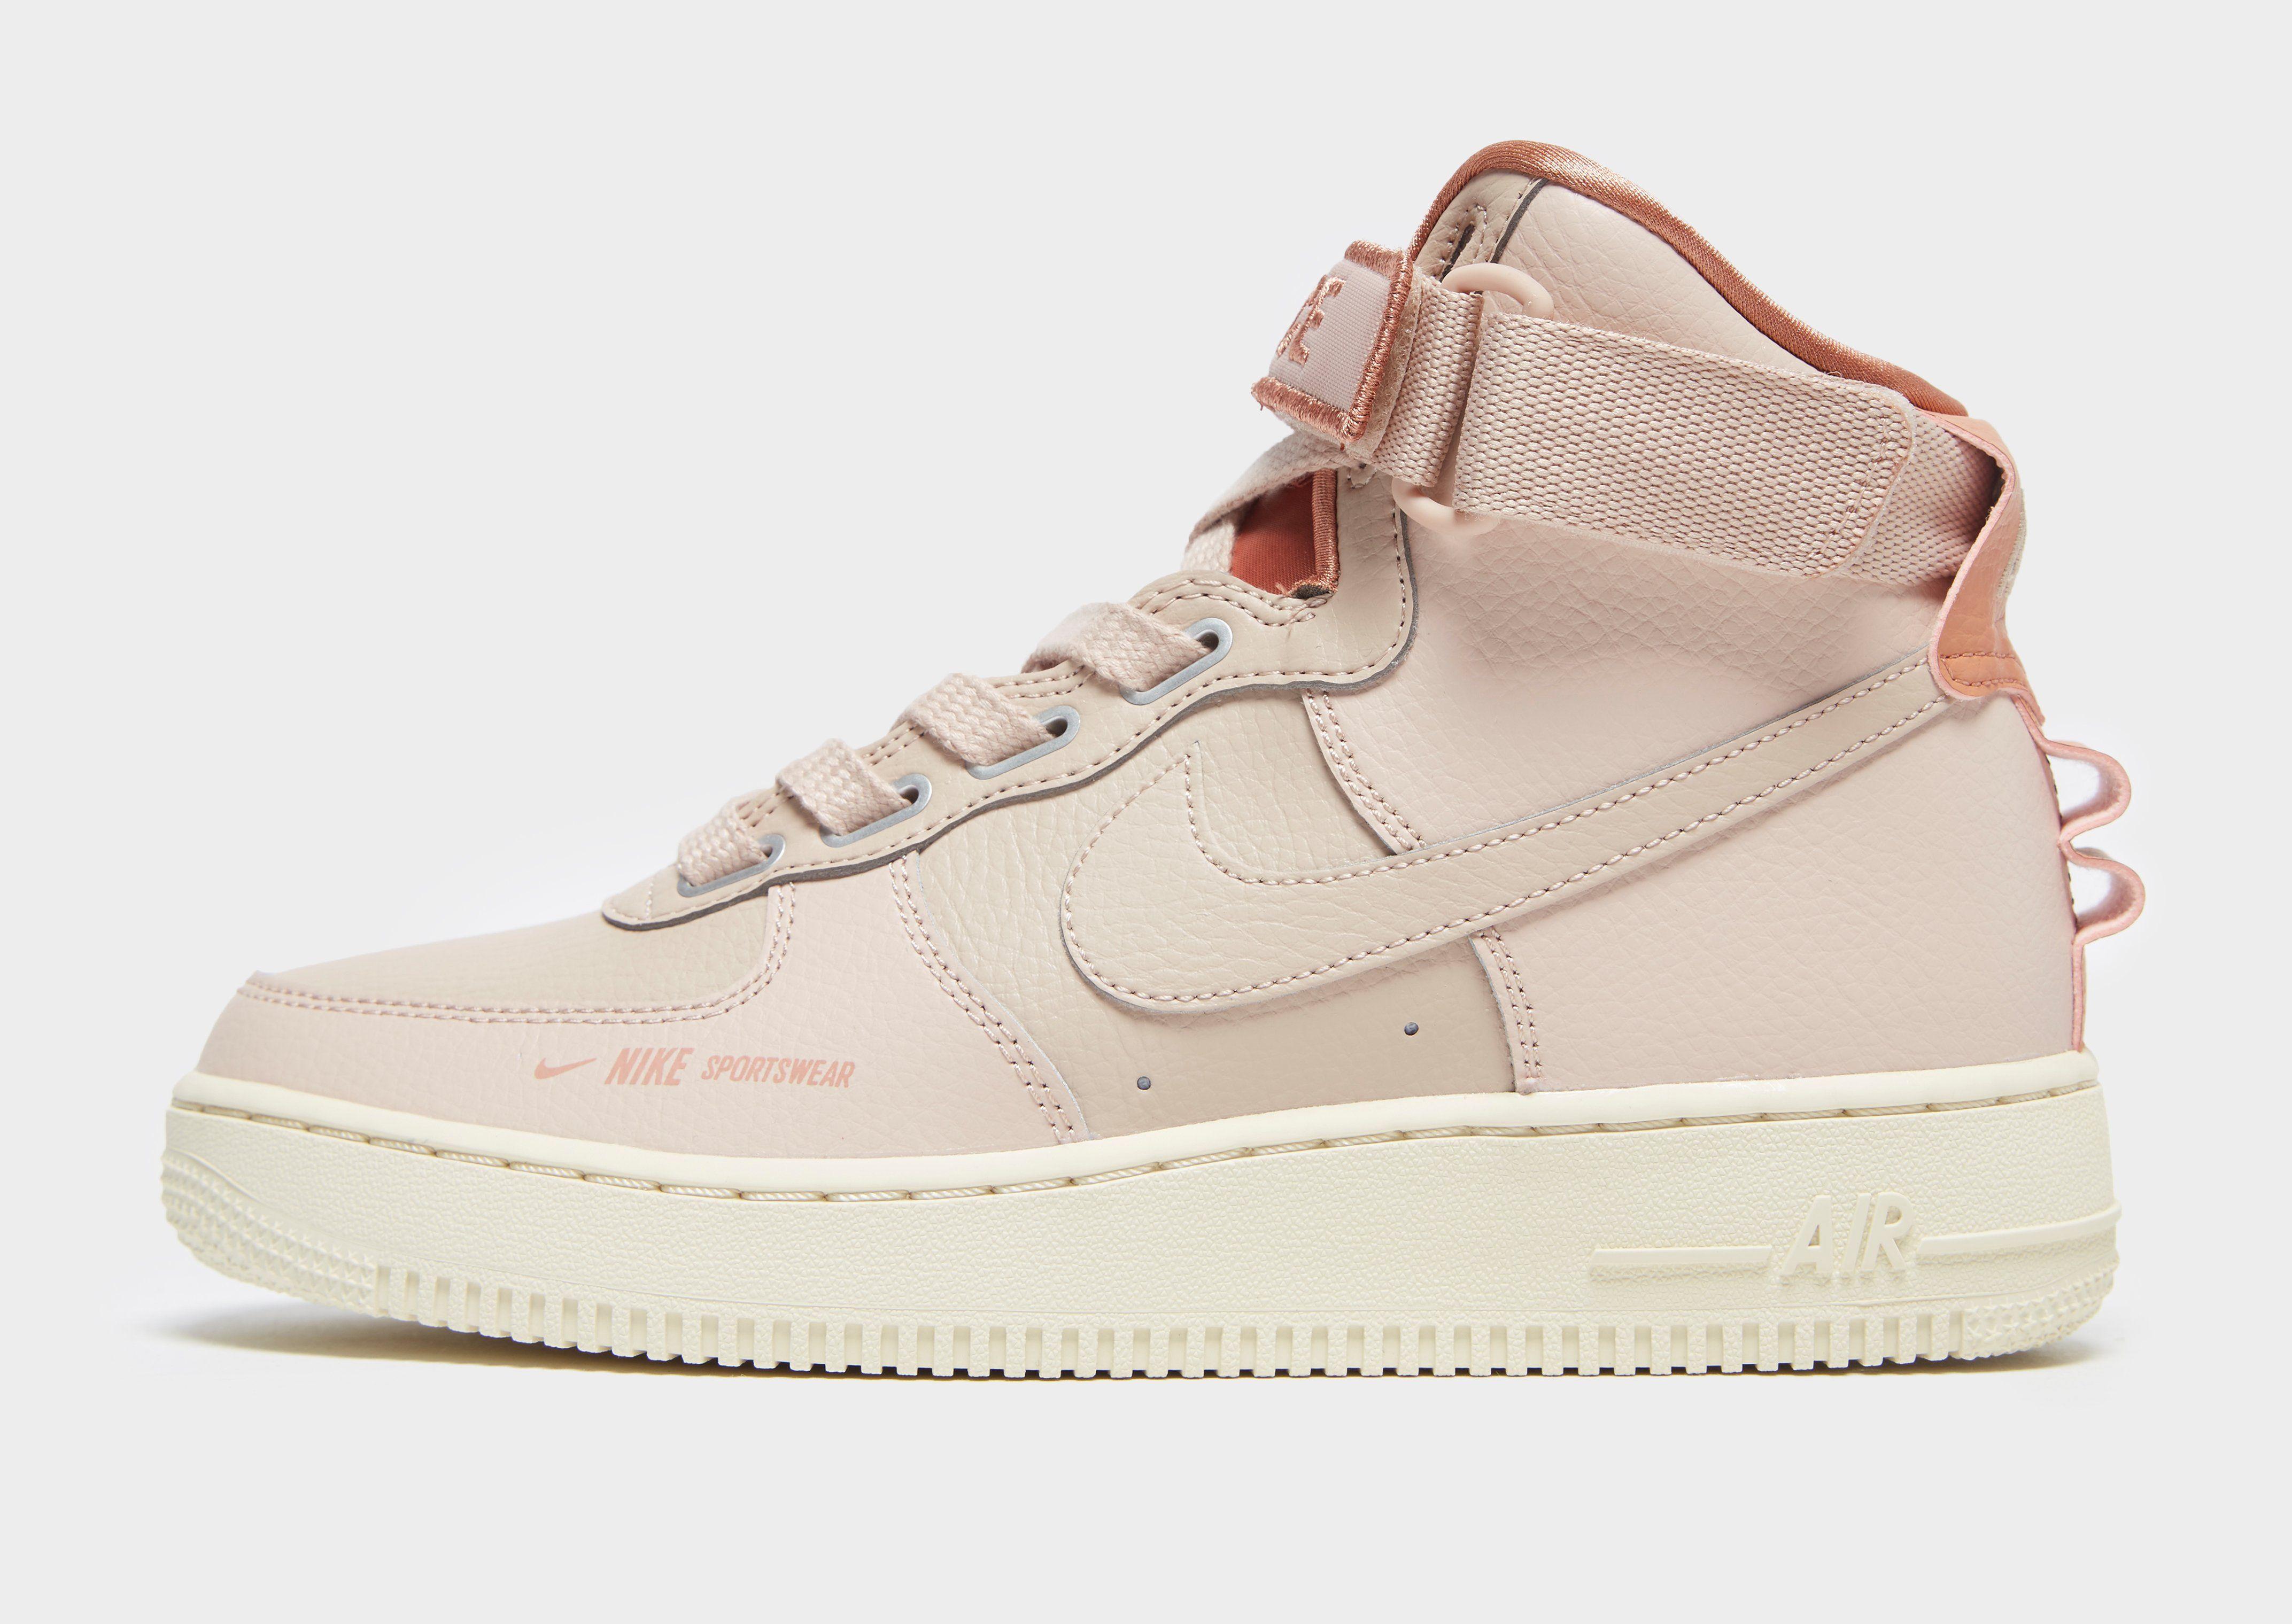 on sale 9a7a8 c24b2 NIKE Nike Air Force 1 High Utility Women s Shoe   JD Sports